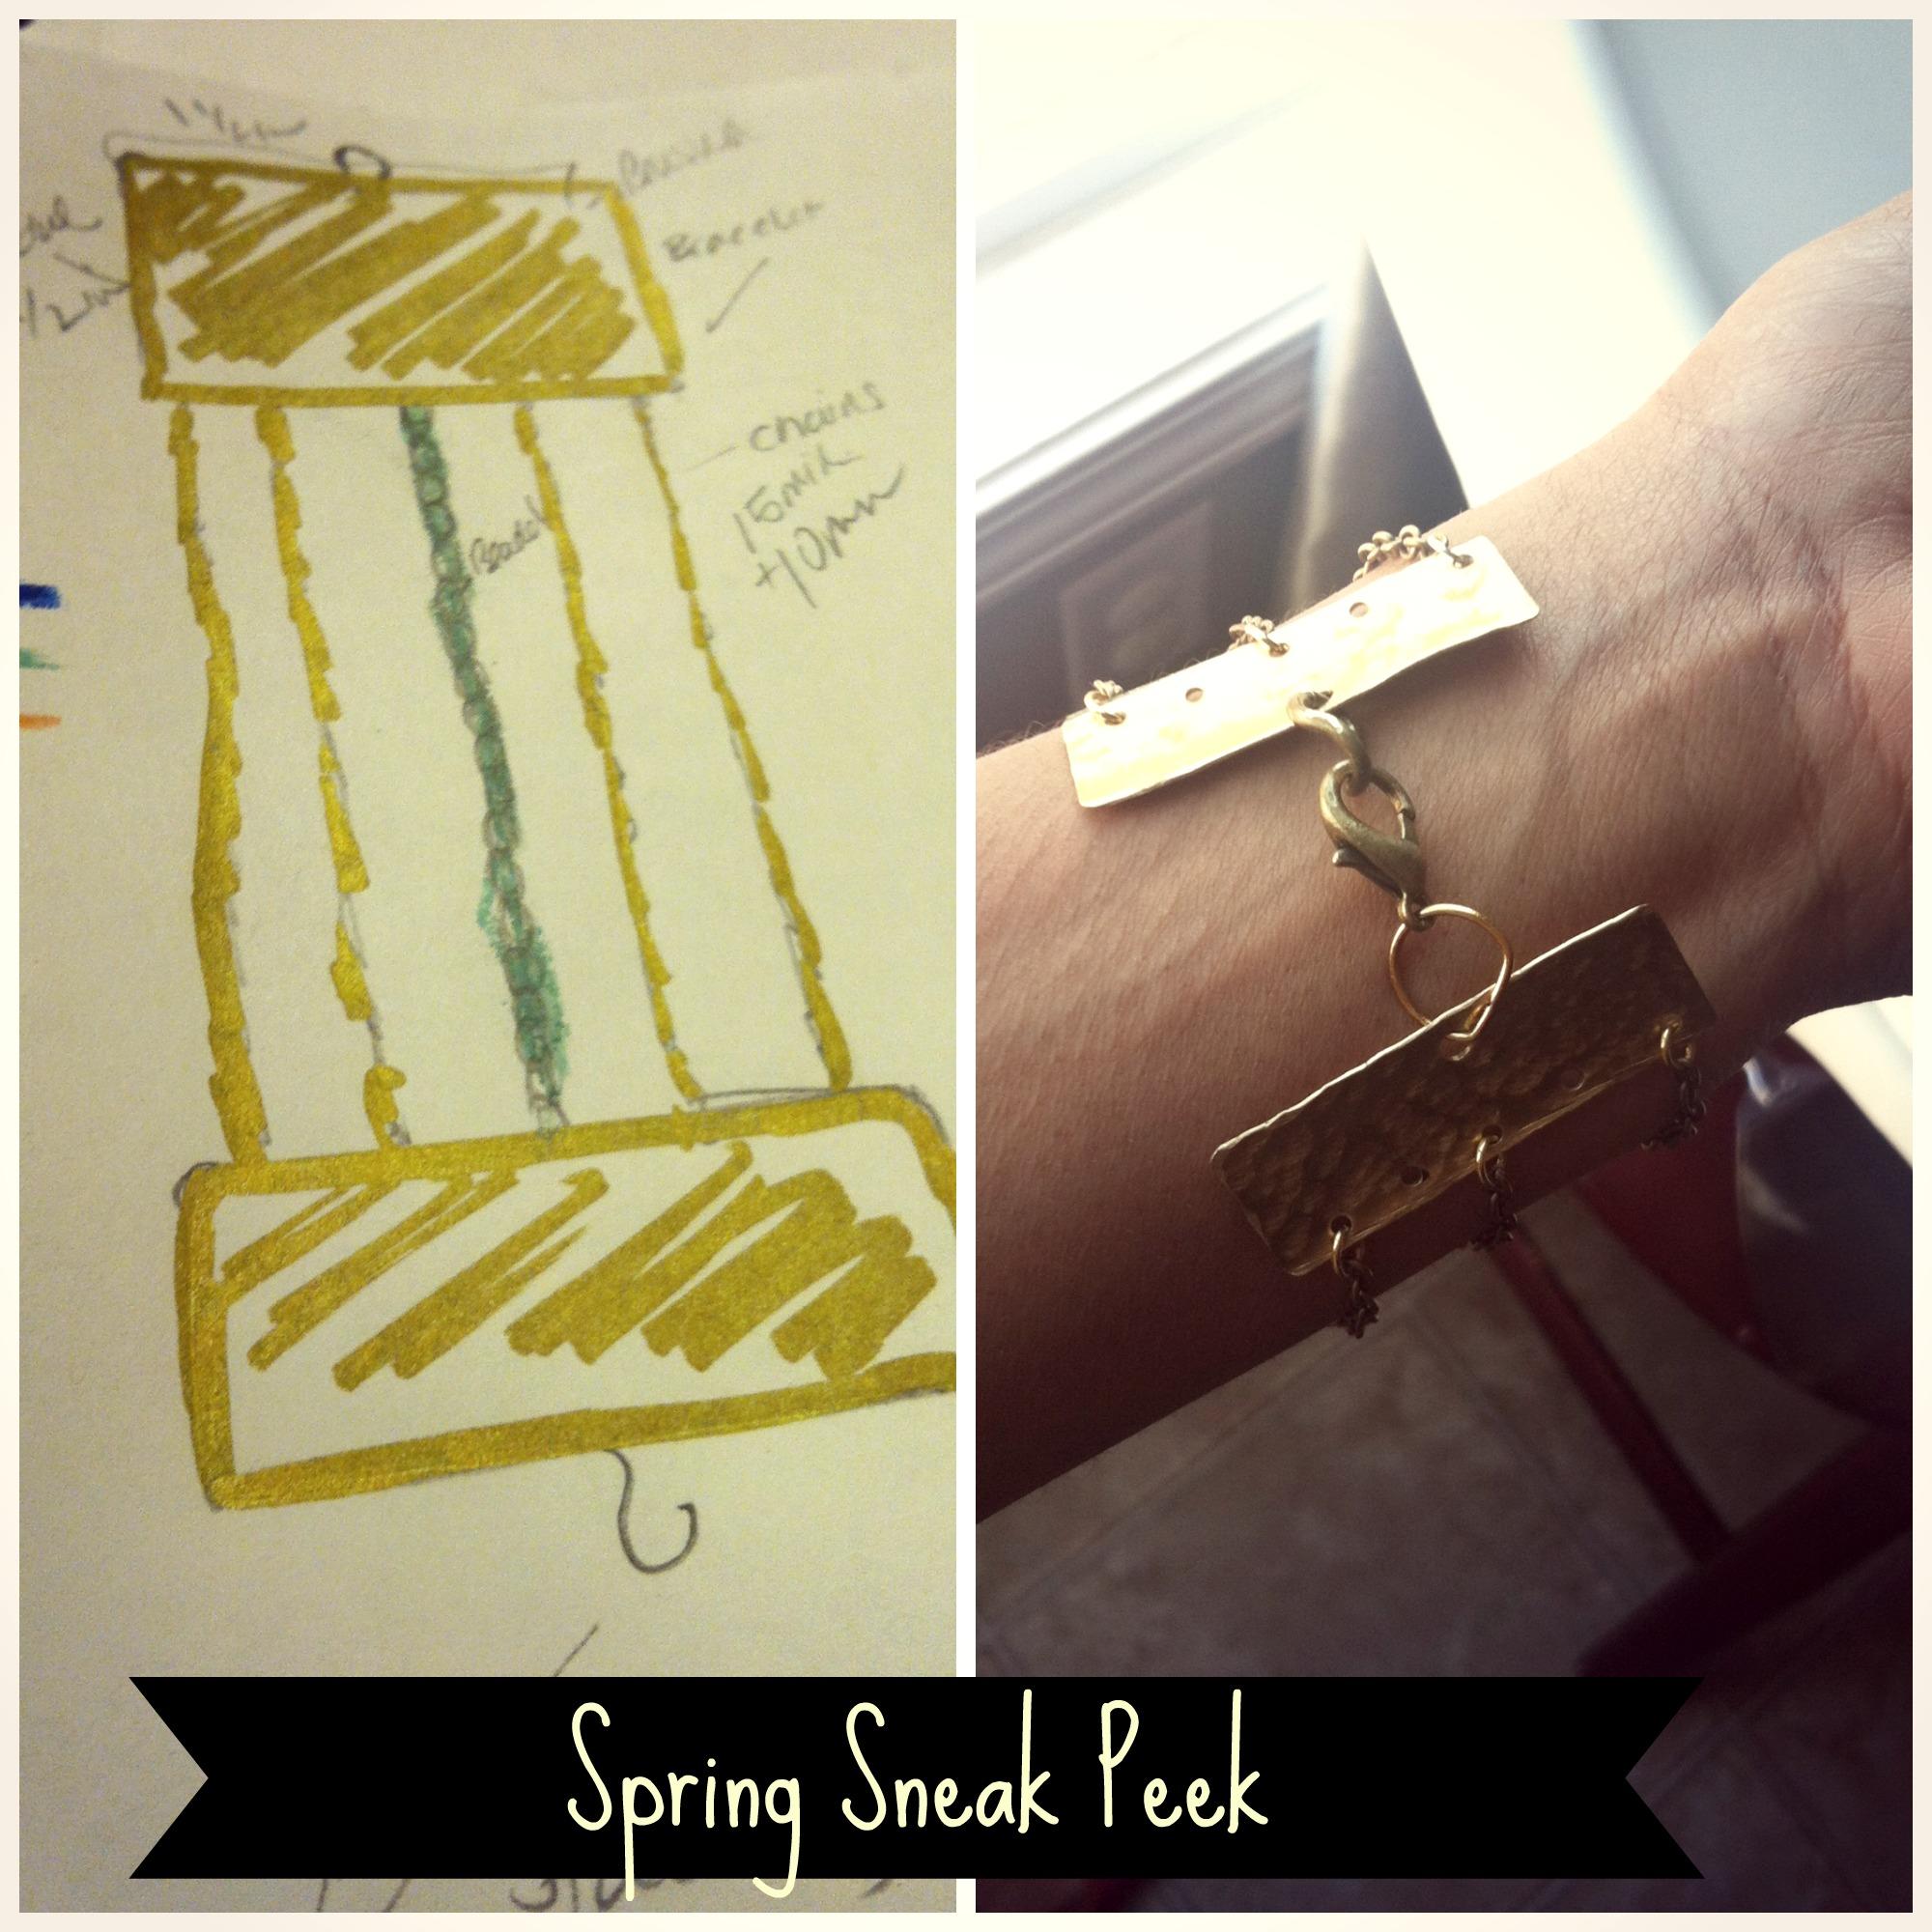 Spring Sneak Peek Bracelet